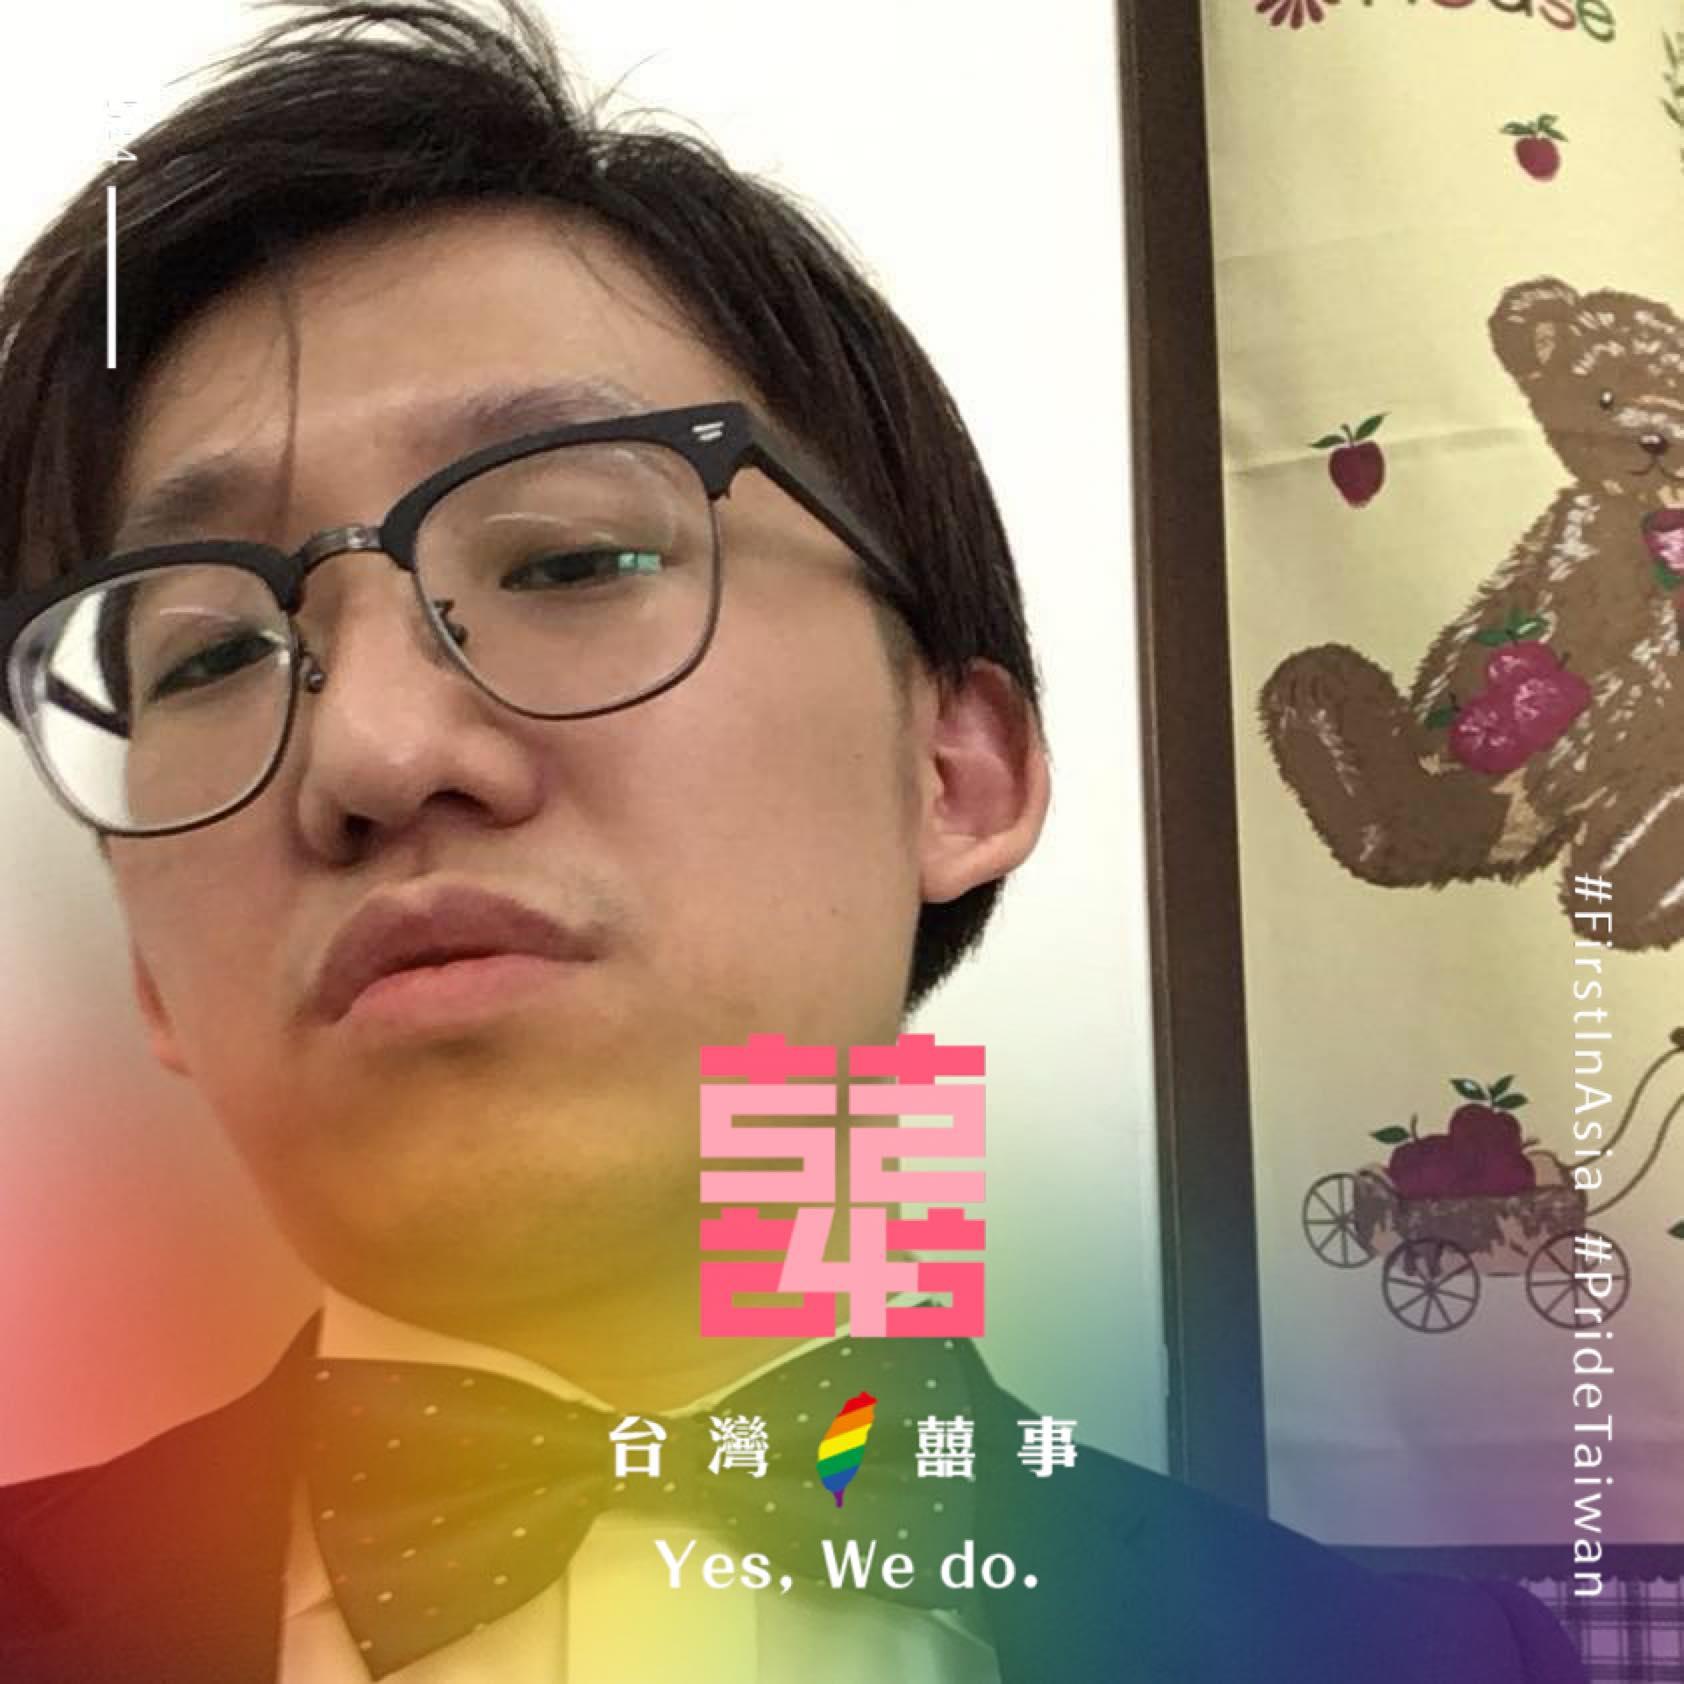 第三週 - Remote Taiwan 主理人談遠端發展